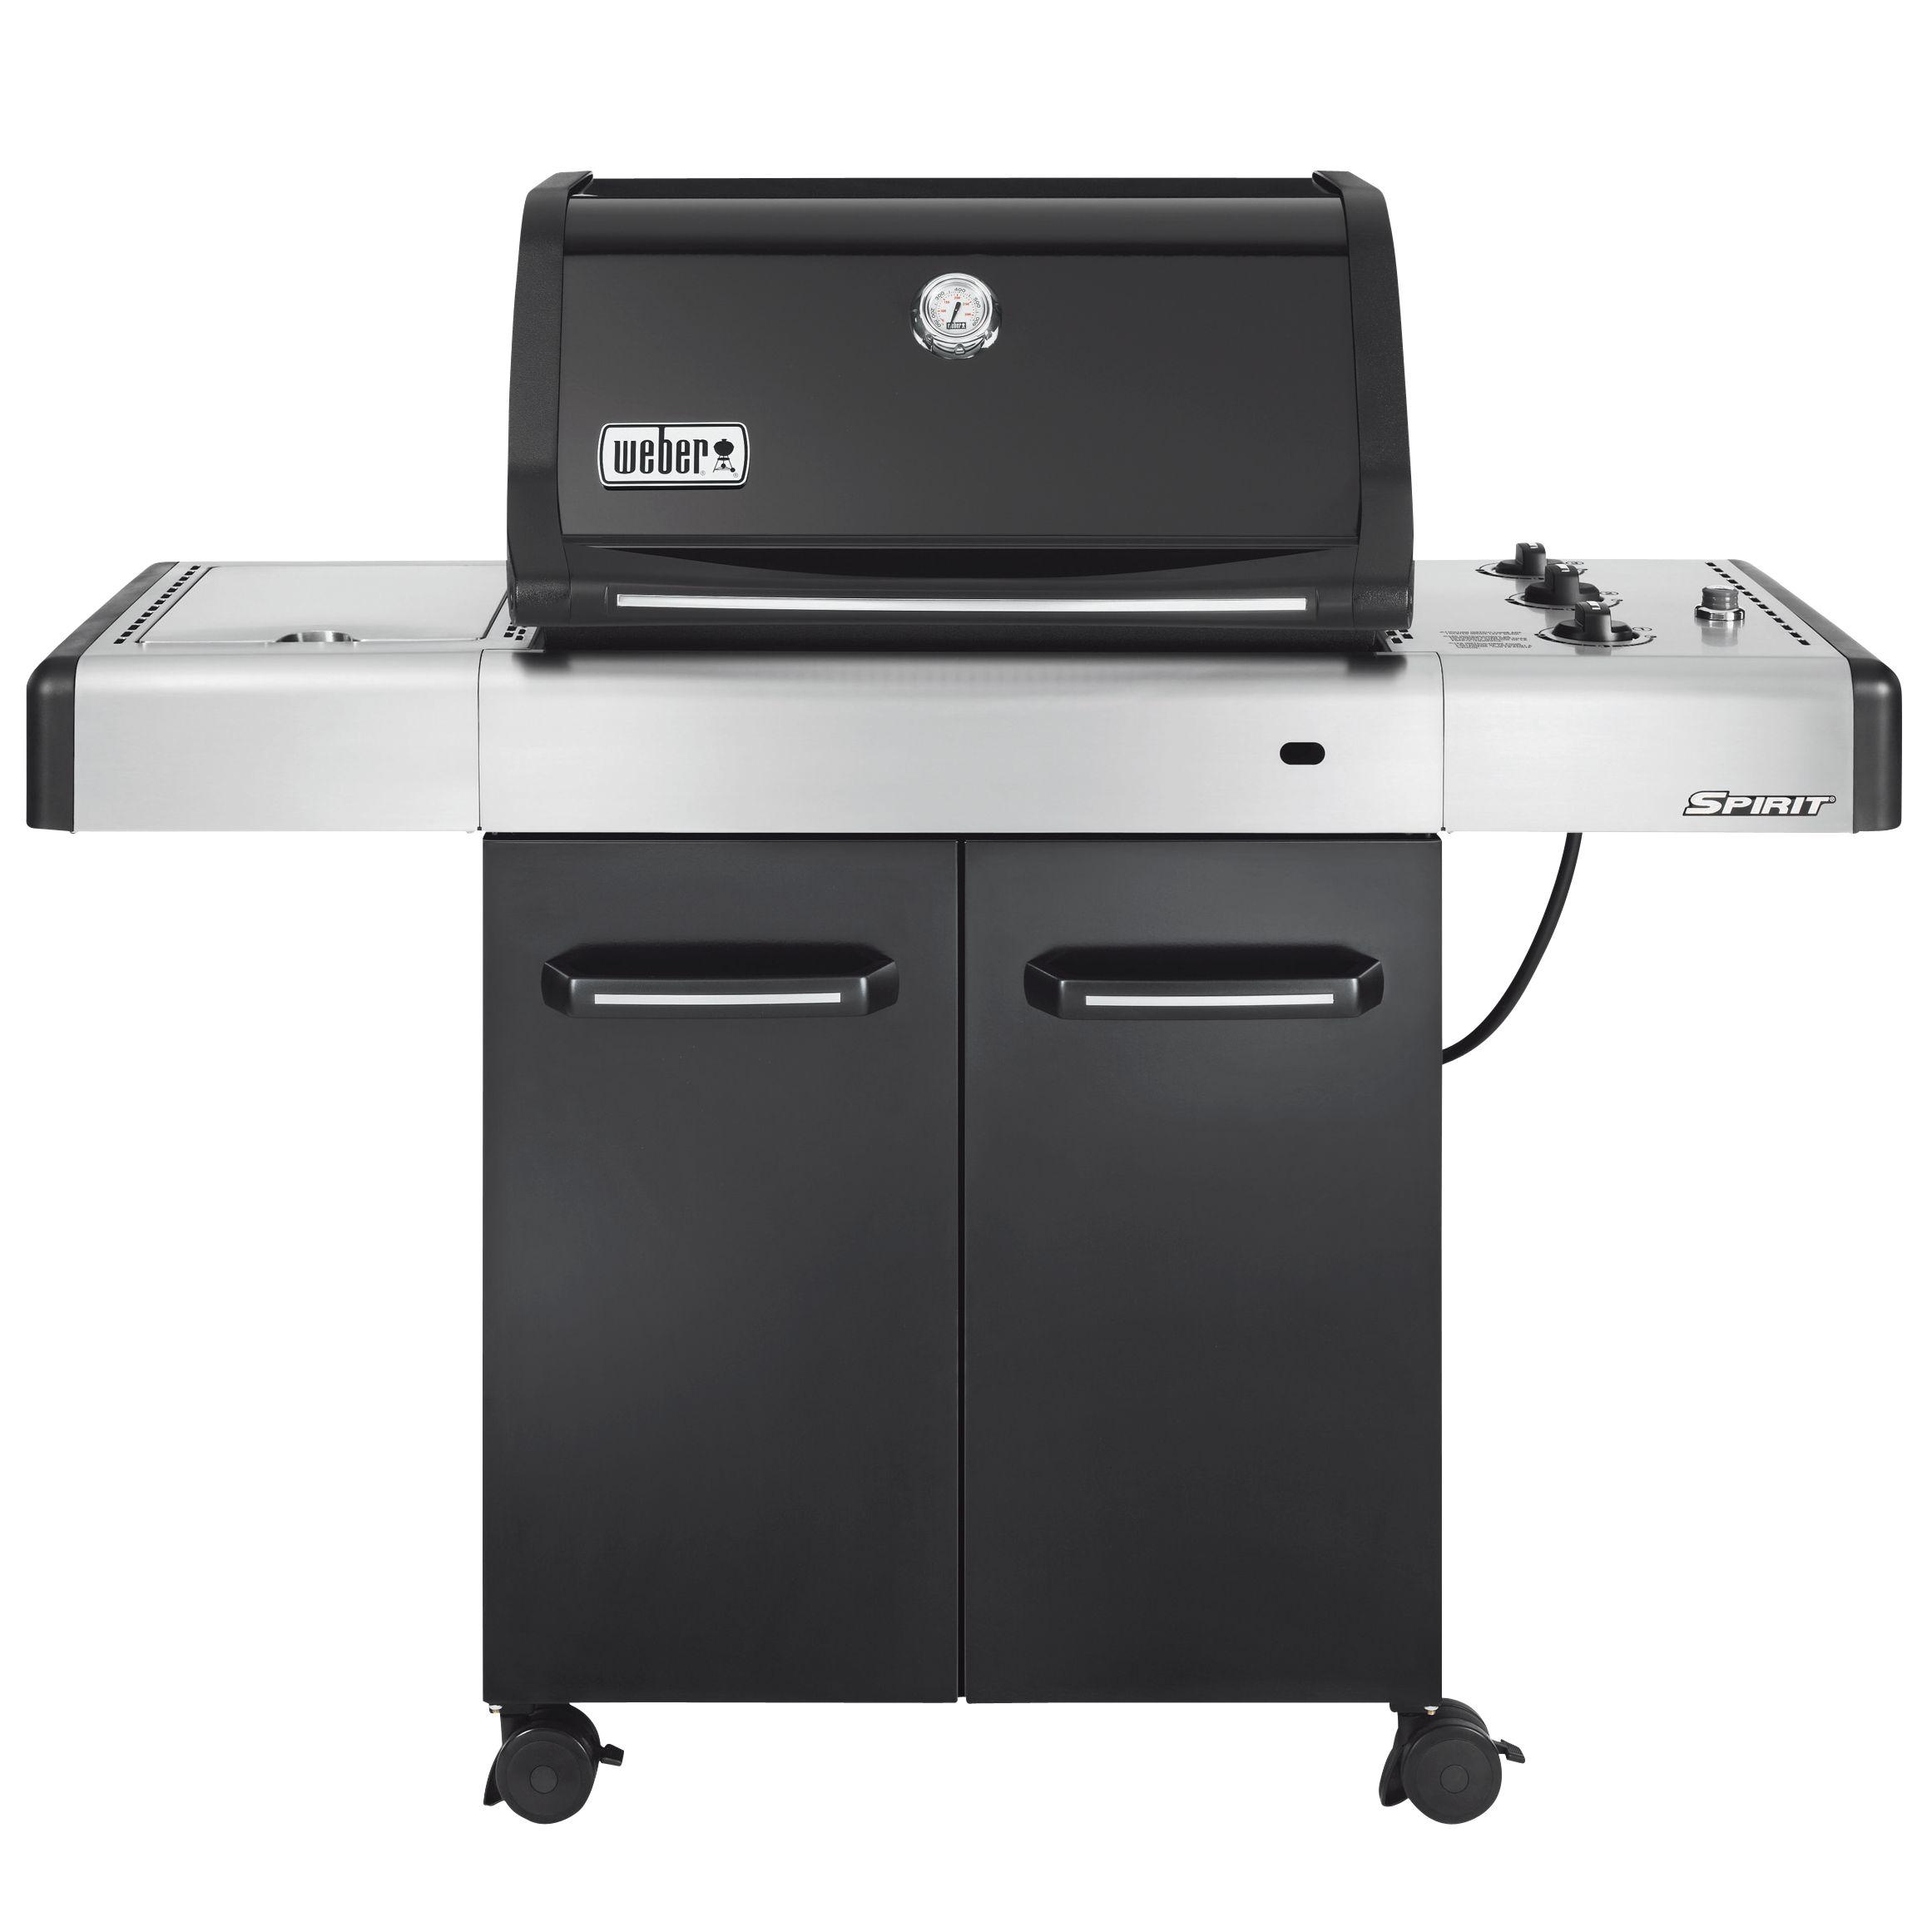 Weber Spirit Premium E320 Gas Barbecue